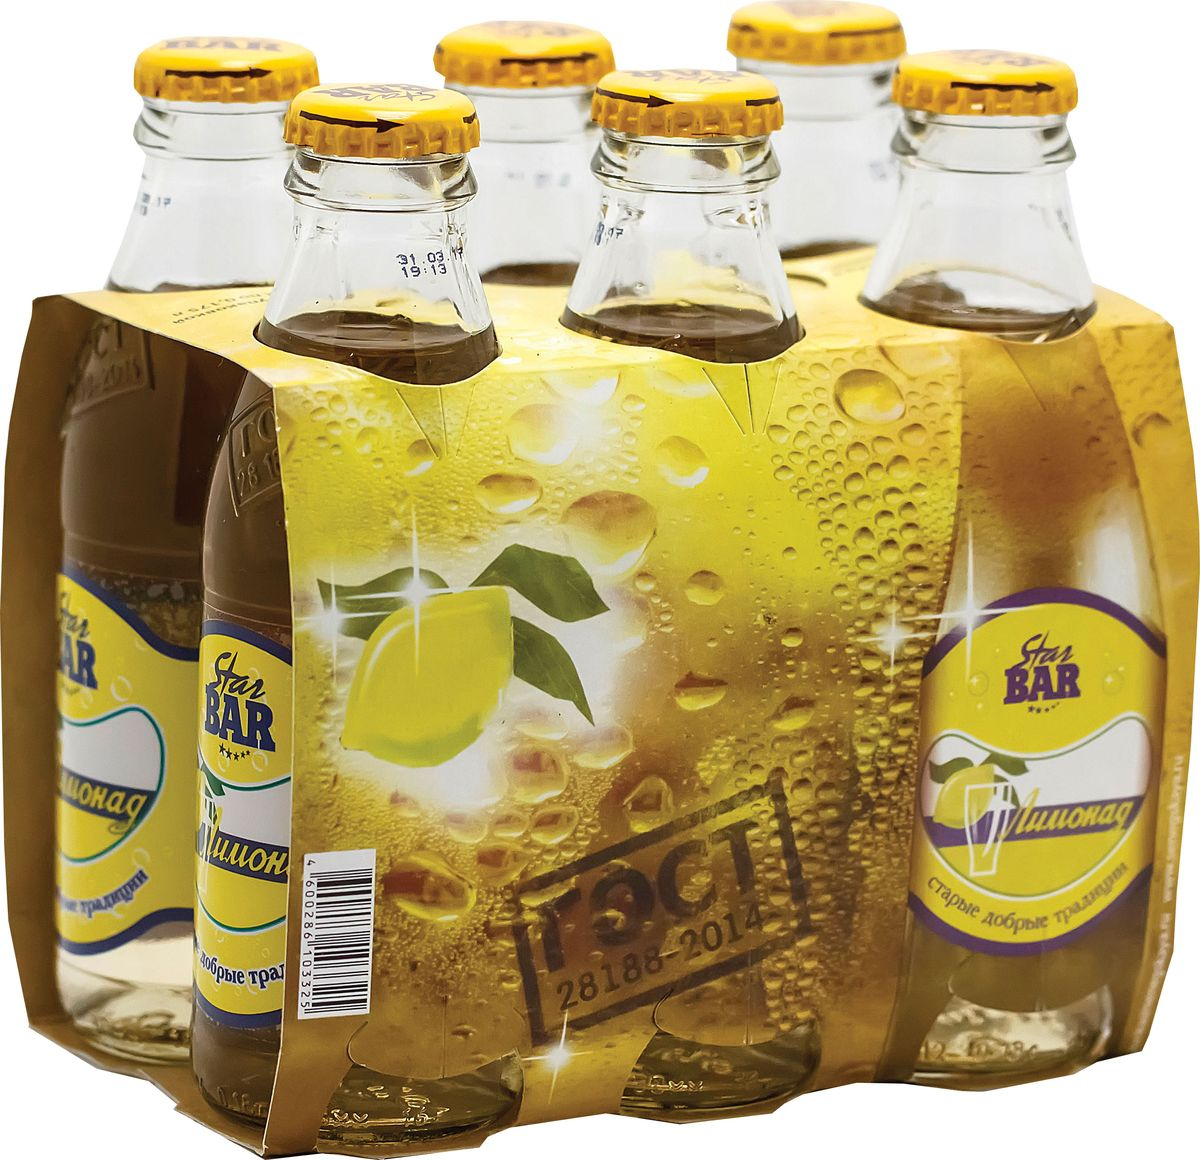 Star Bar Лимонад, 6 шт по 0,175 л